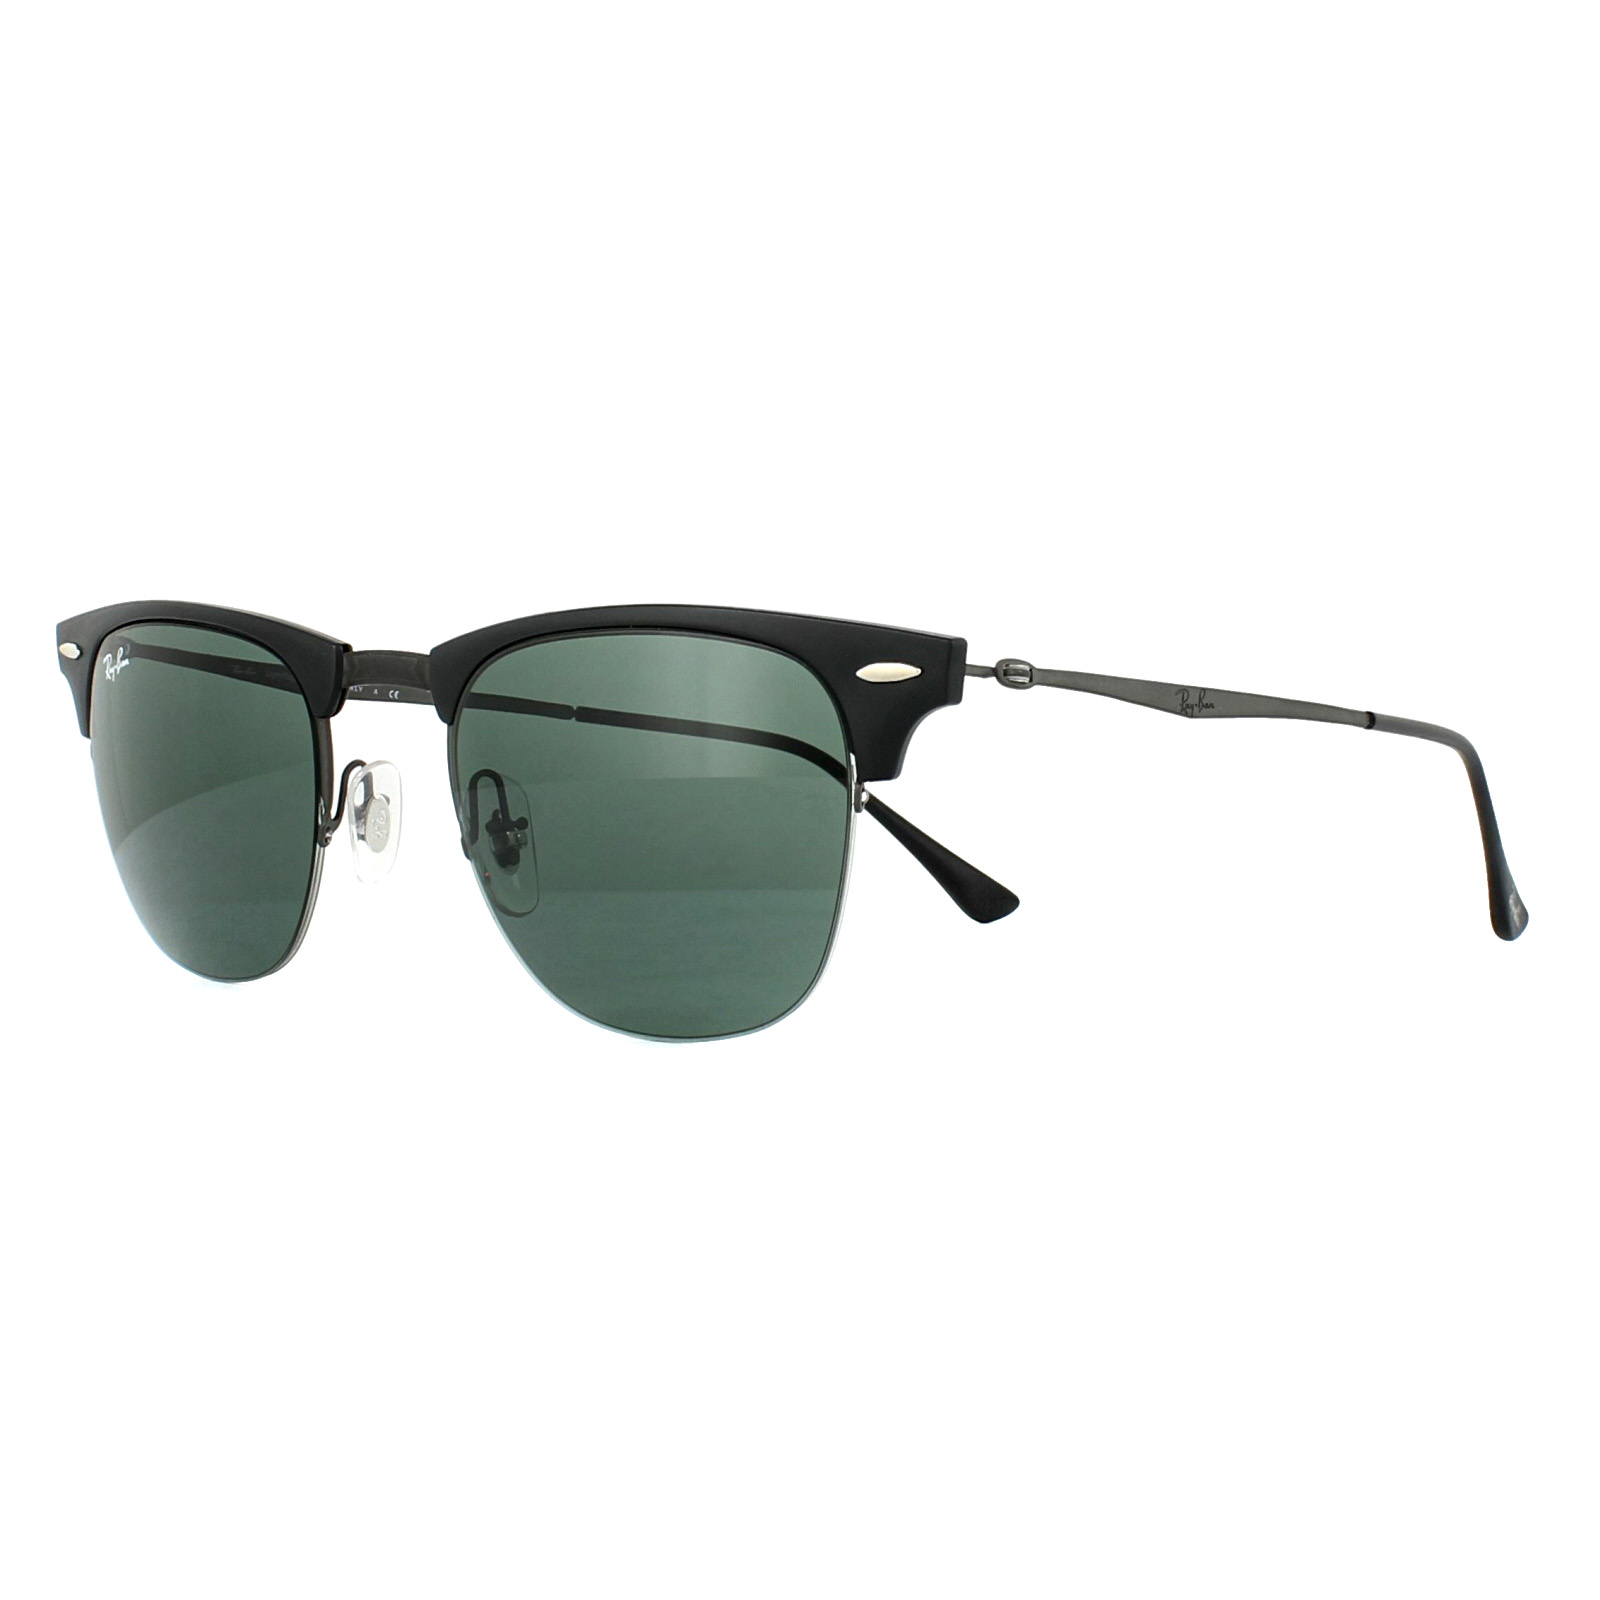 0cfec0936b782 Sentinel Ray-Ban Sunglasses Clubmaster Light Ray 8056 154 71 Black Gunmetal  Green 51mm